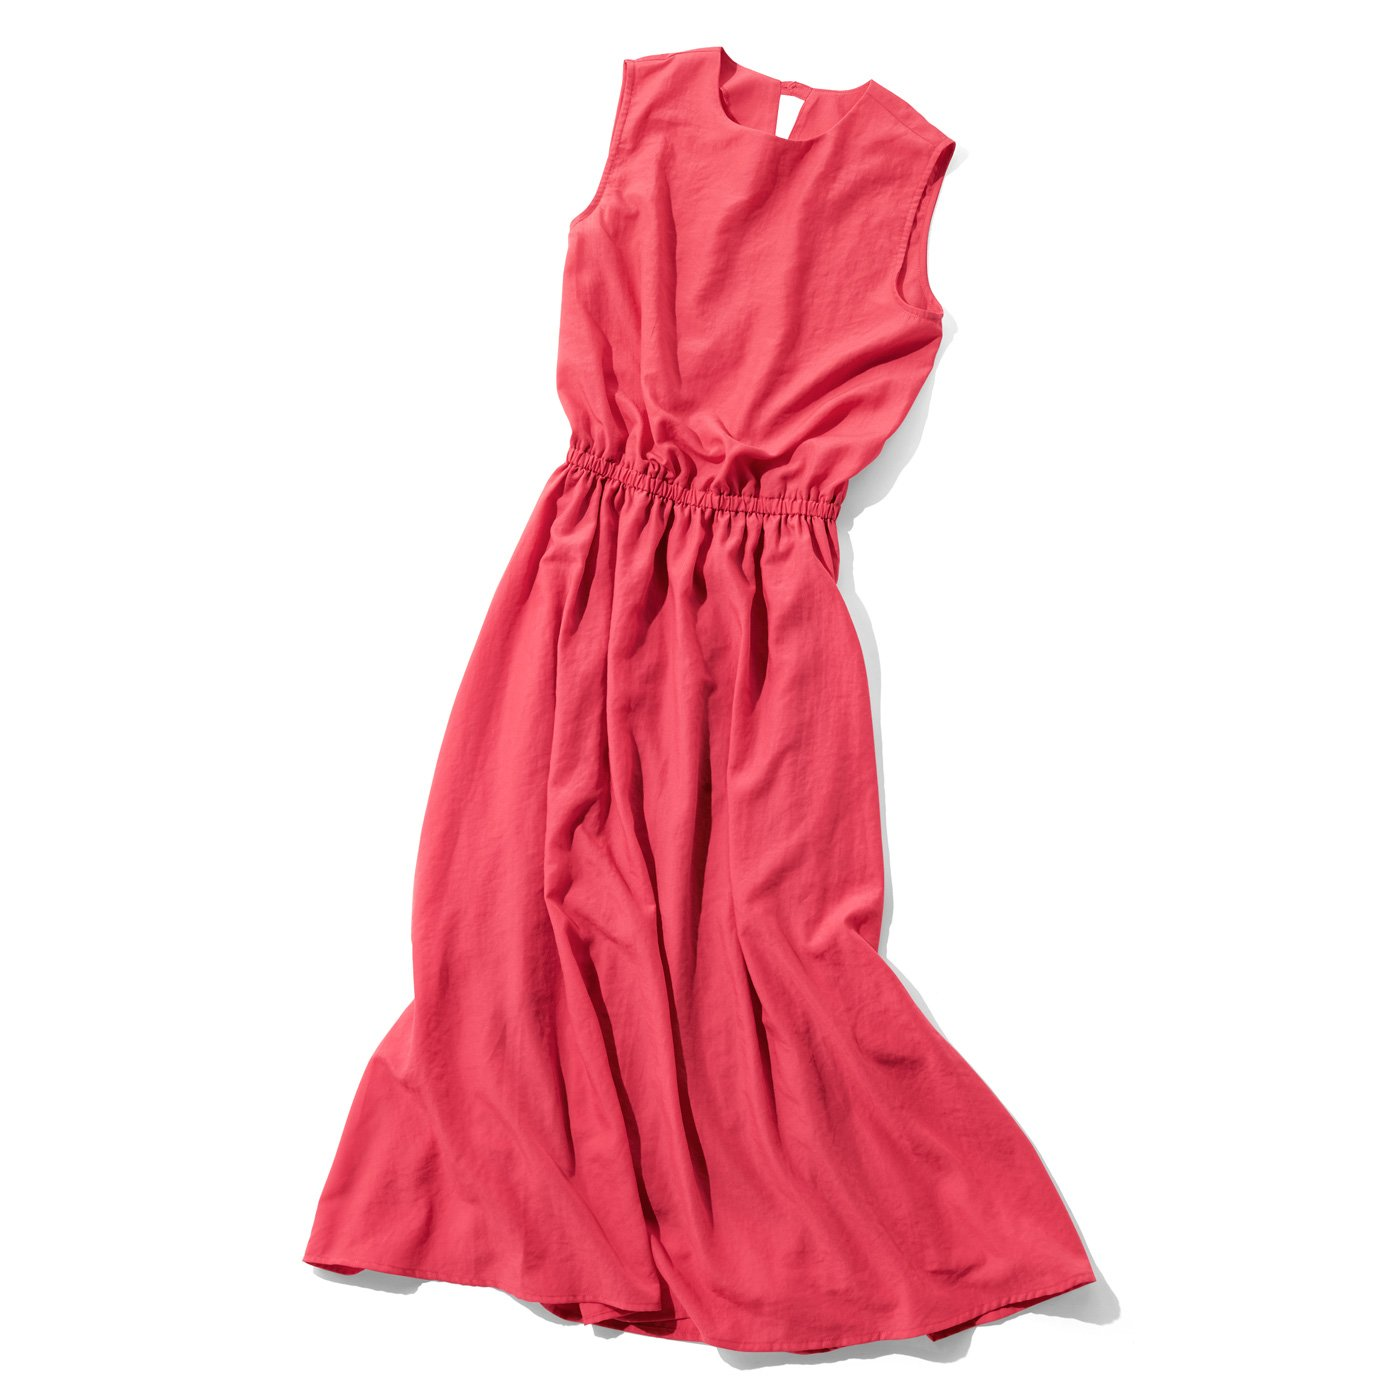 IEDIT 一枚で華やぐサマーロングドレス〈コーラルレッド〉